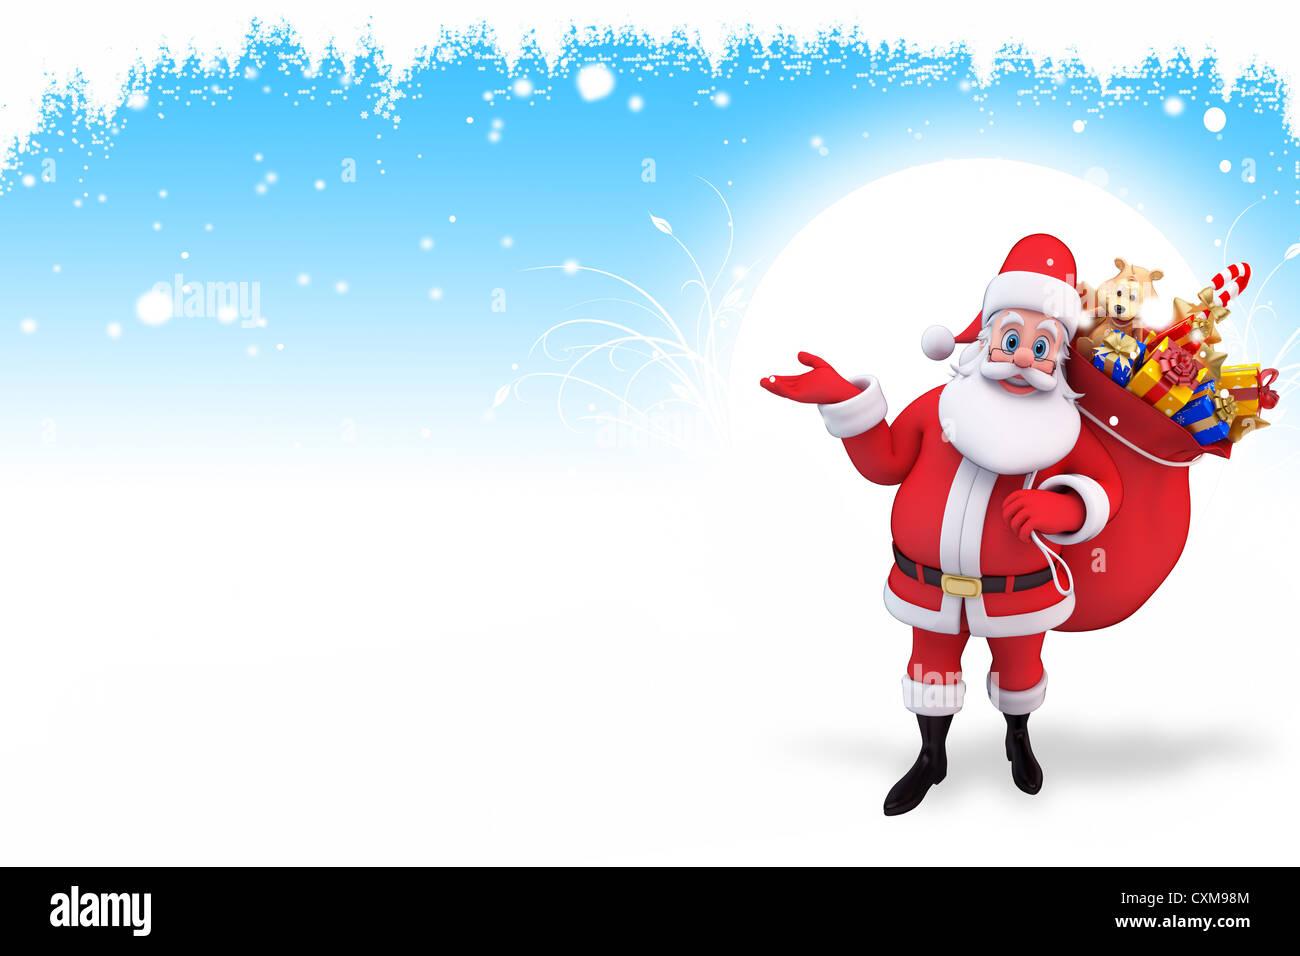 Santa Sleigh Reindeer Deer Gifts Iceland Blue Christmas Stock Photos ...